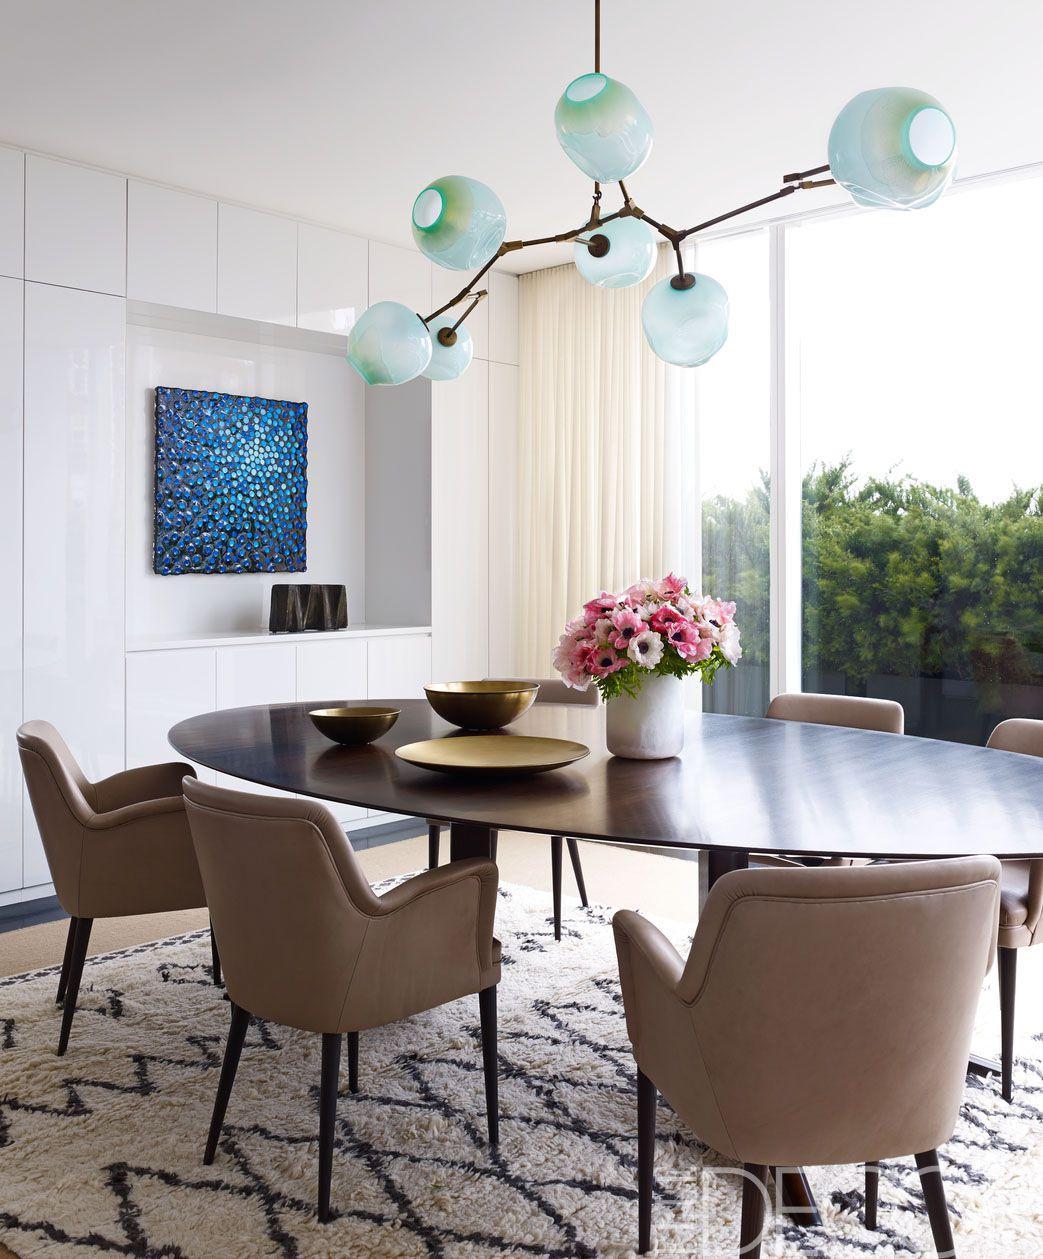 25 Modern Dining Room Decorating Ideas - Contemporary Dining Room